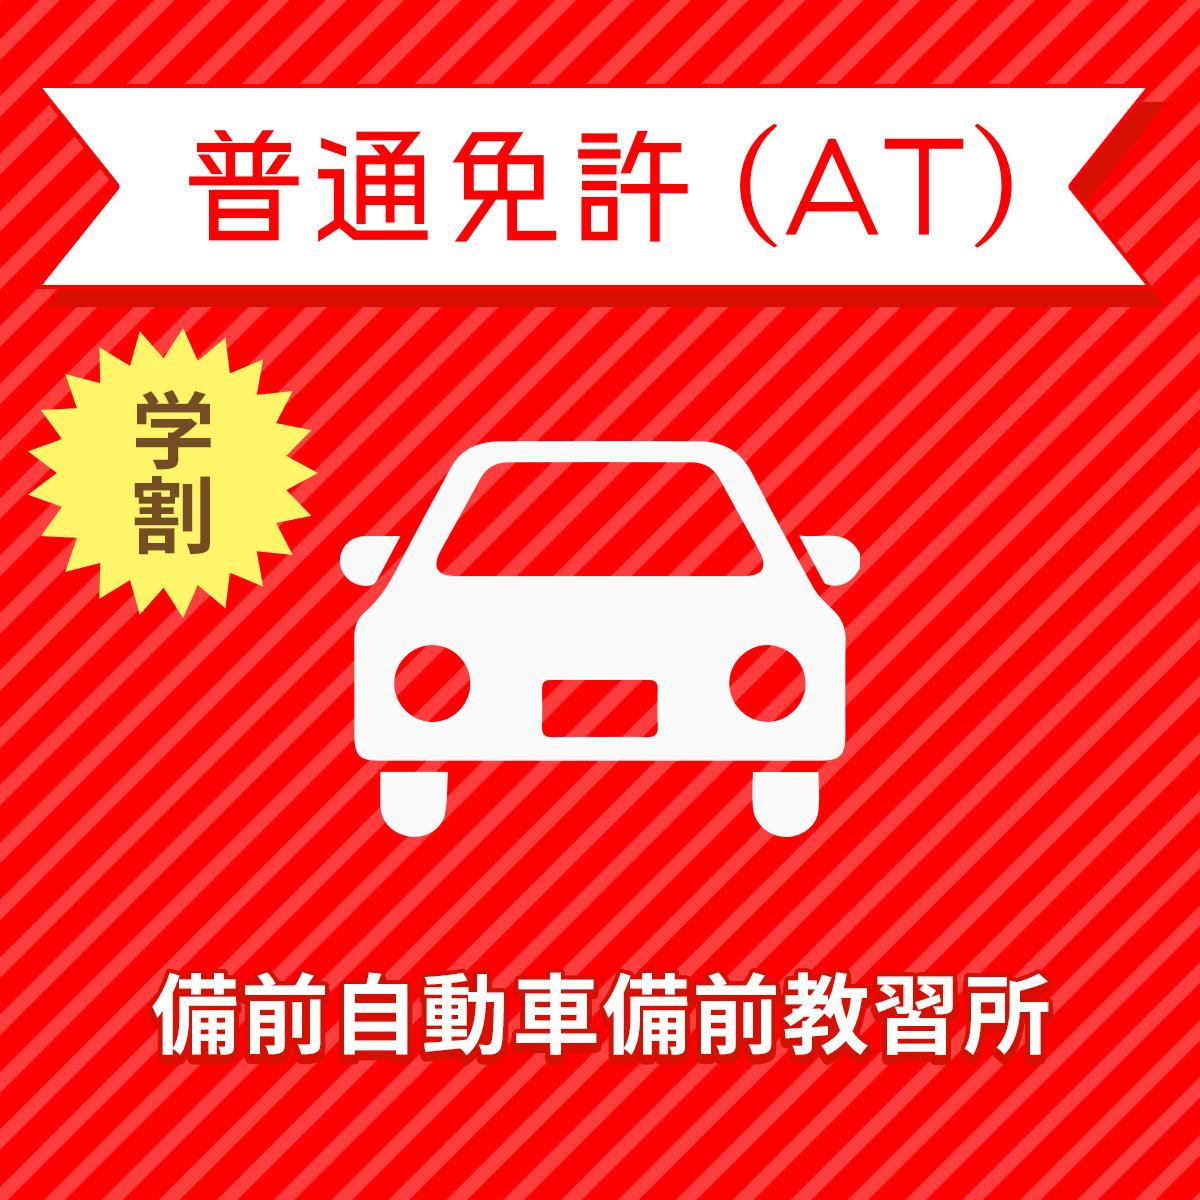 【岡山県備前市】普通車ATコース(学生料金)<免許なし/原付免許所持対象>